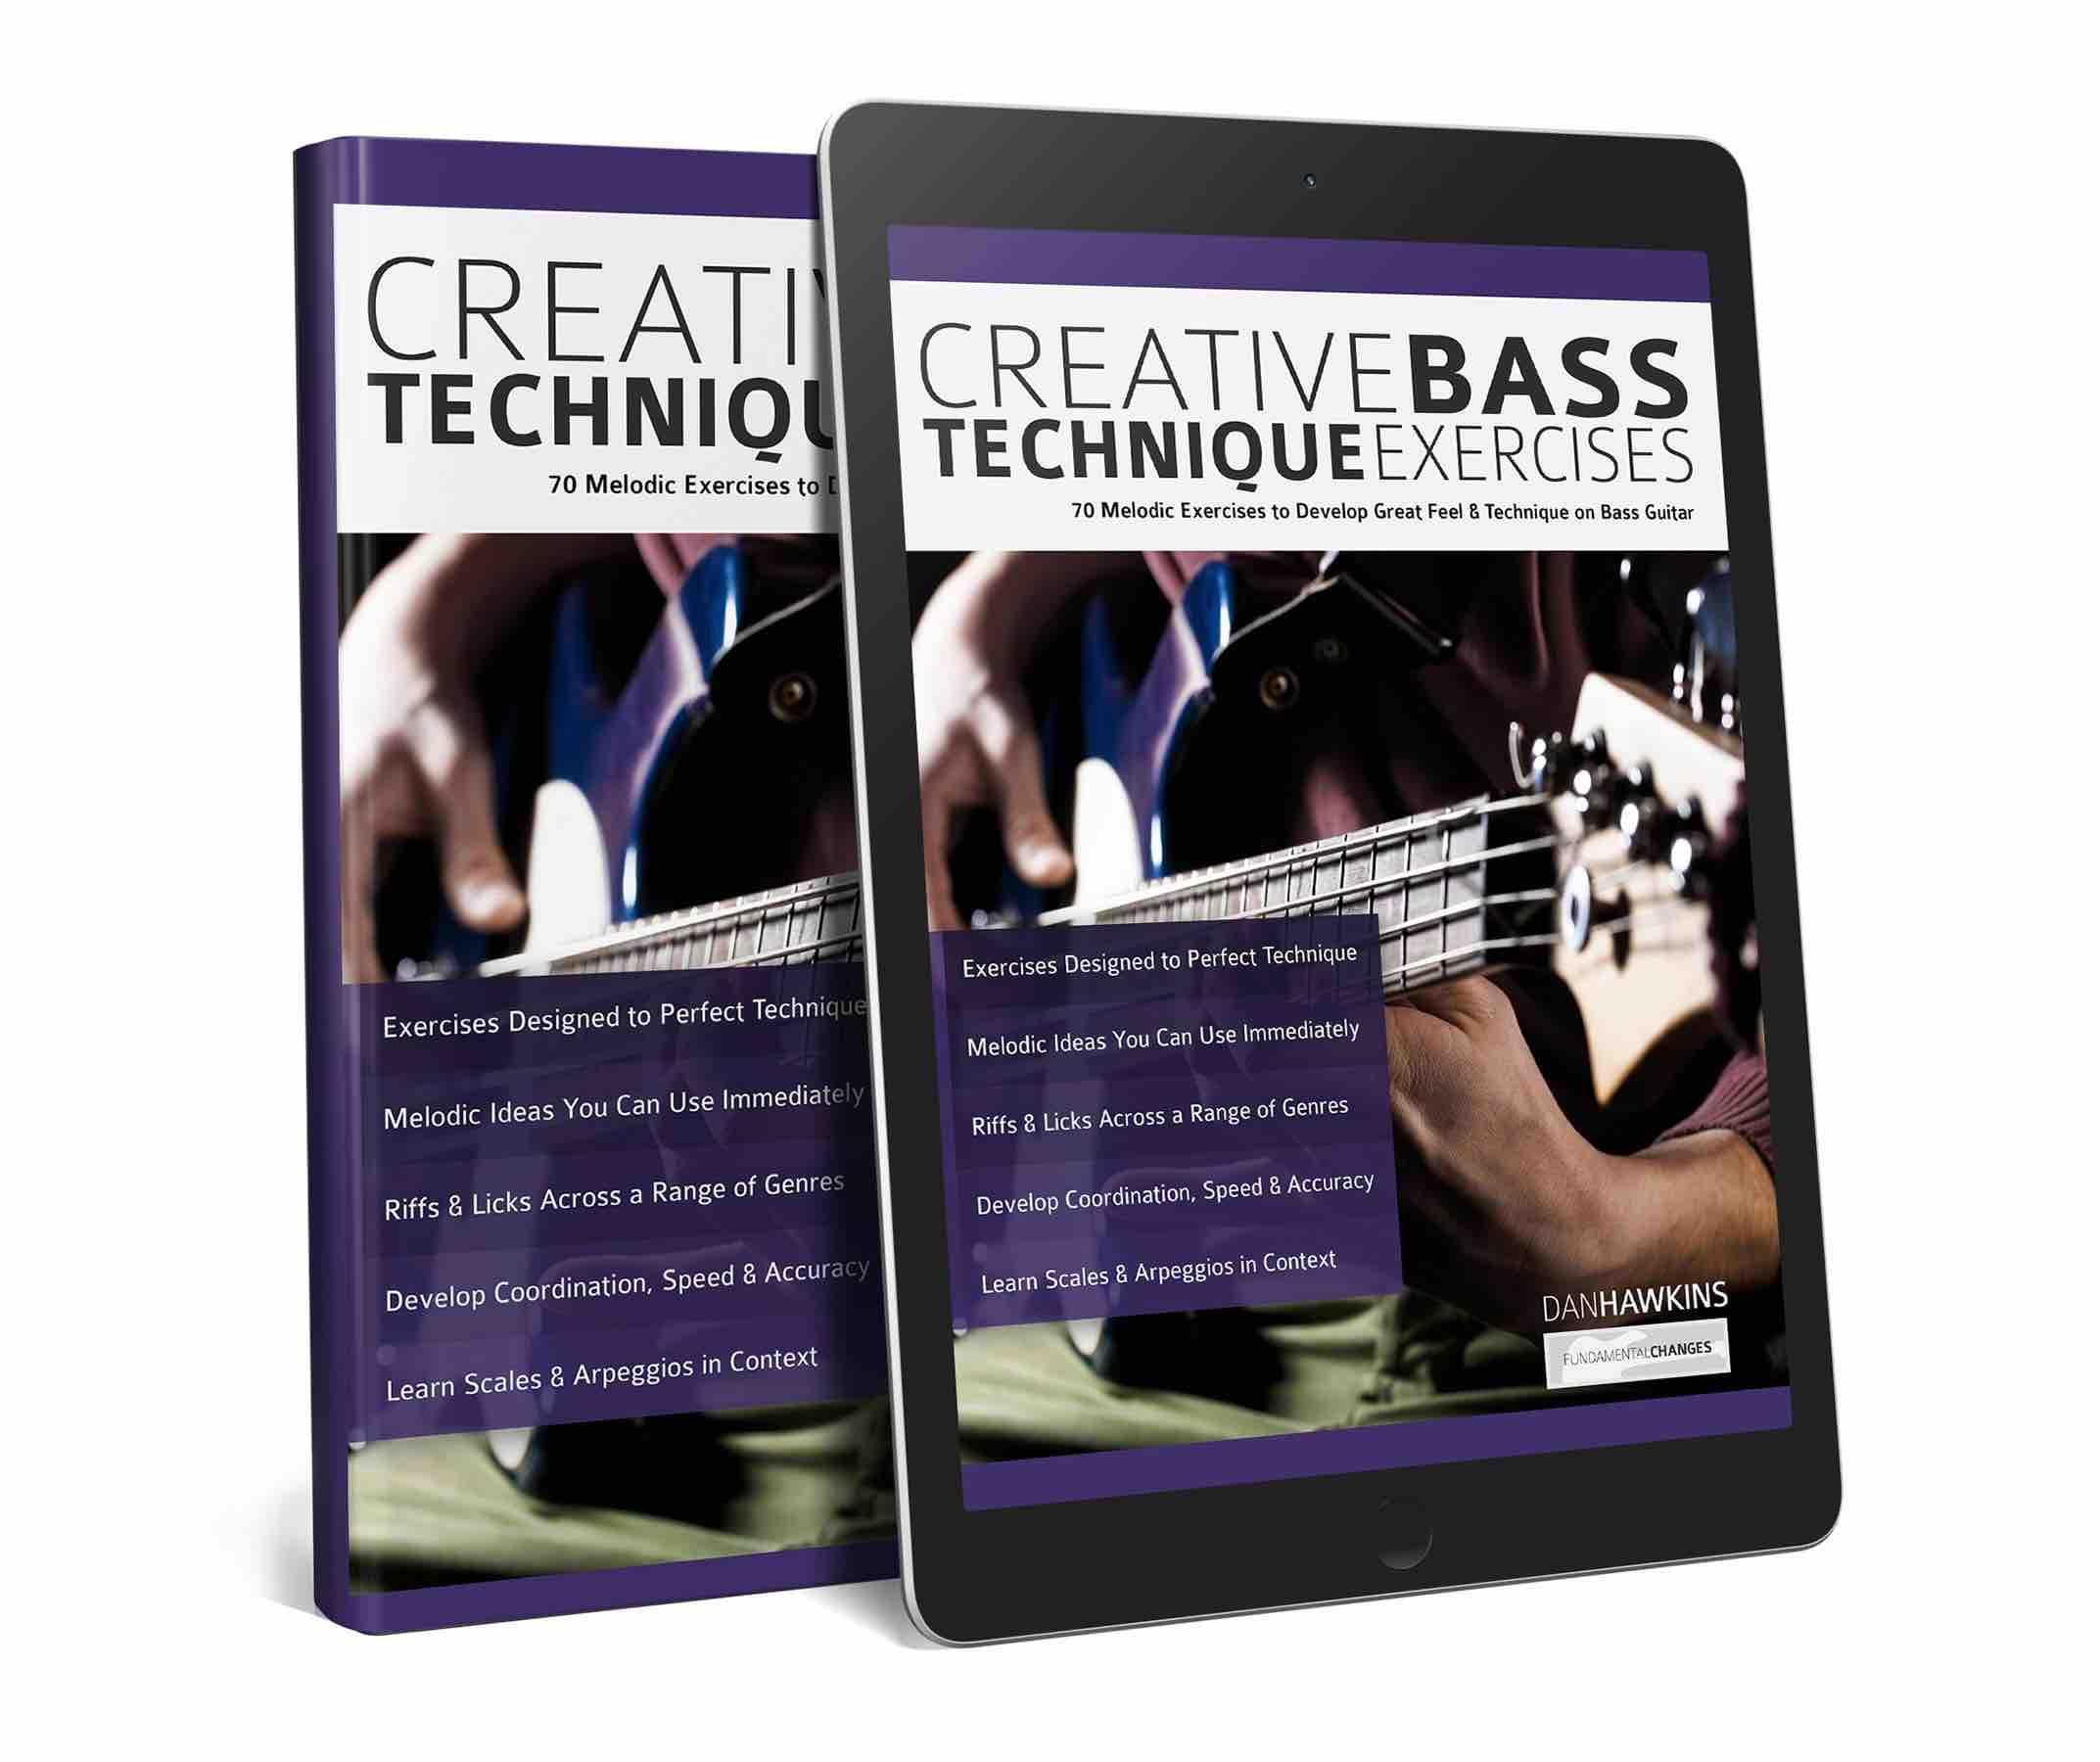 Creative bass technique exercises dan hawkins